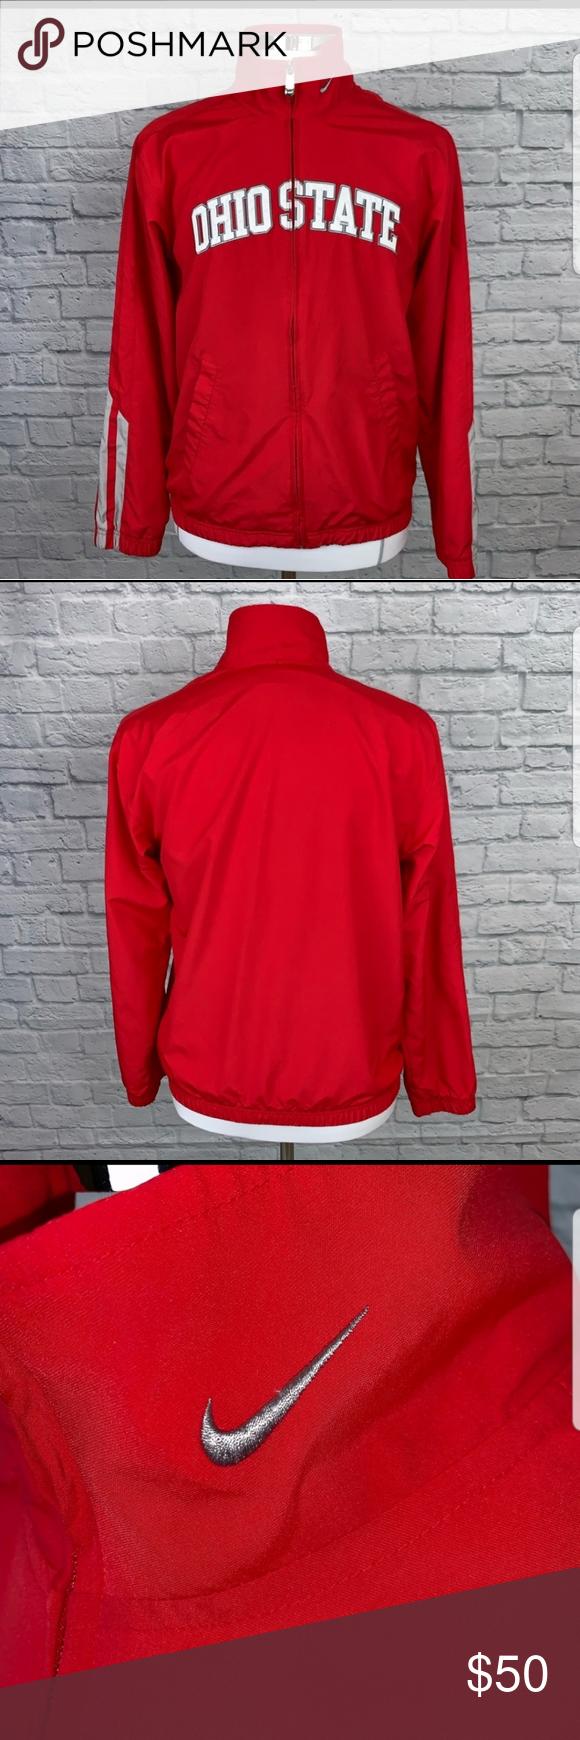 Ohio State Buckeyes Excellent condition Nike Jackets & Coats Performance Jackets #ohiostatebuckeyes